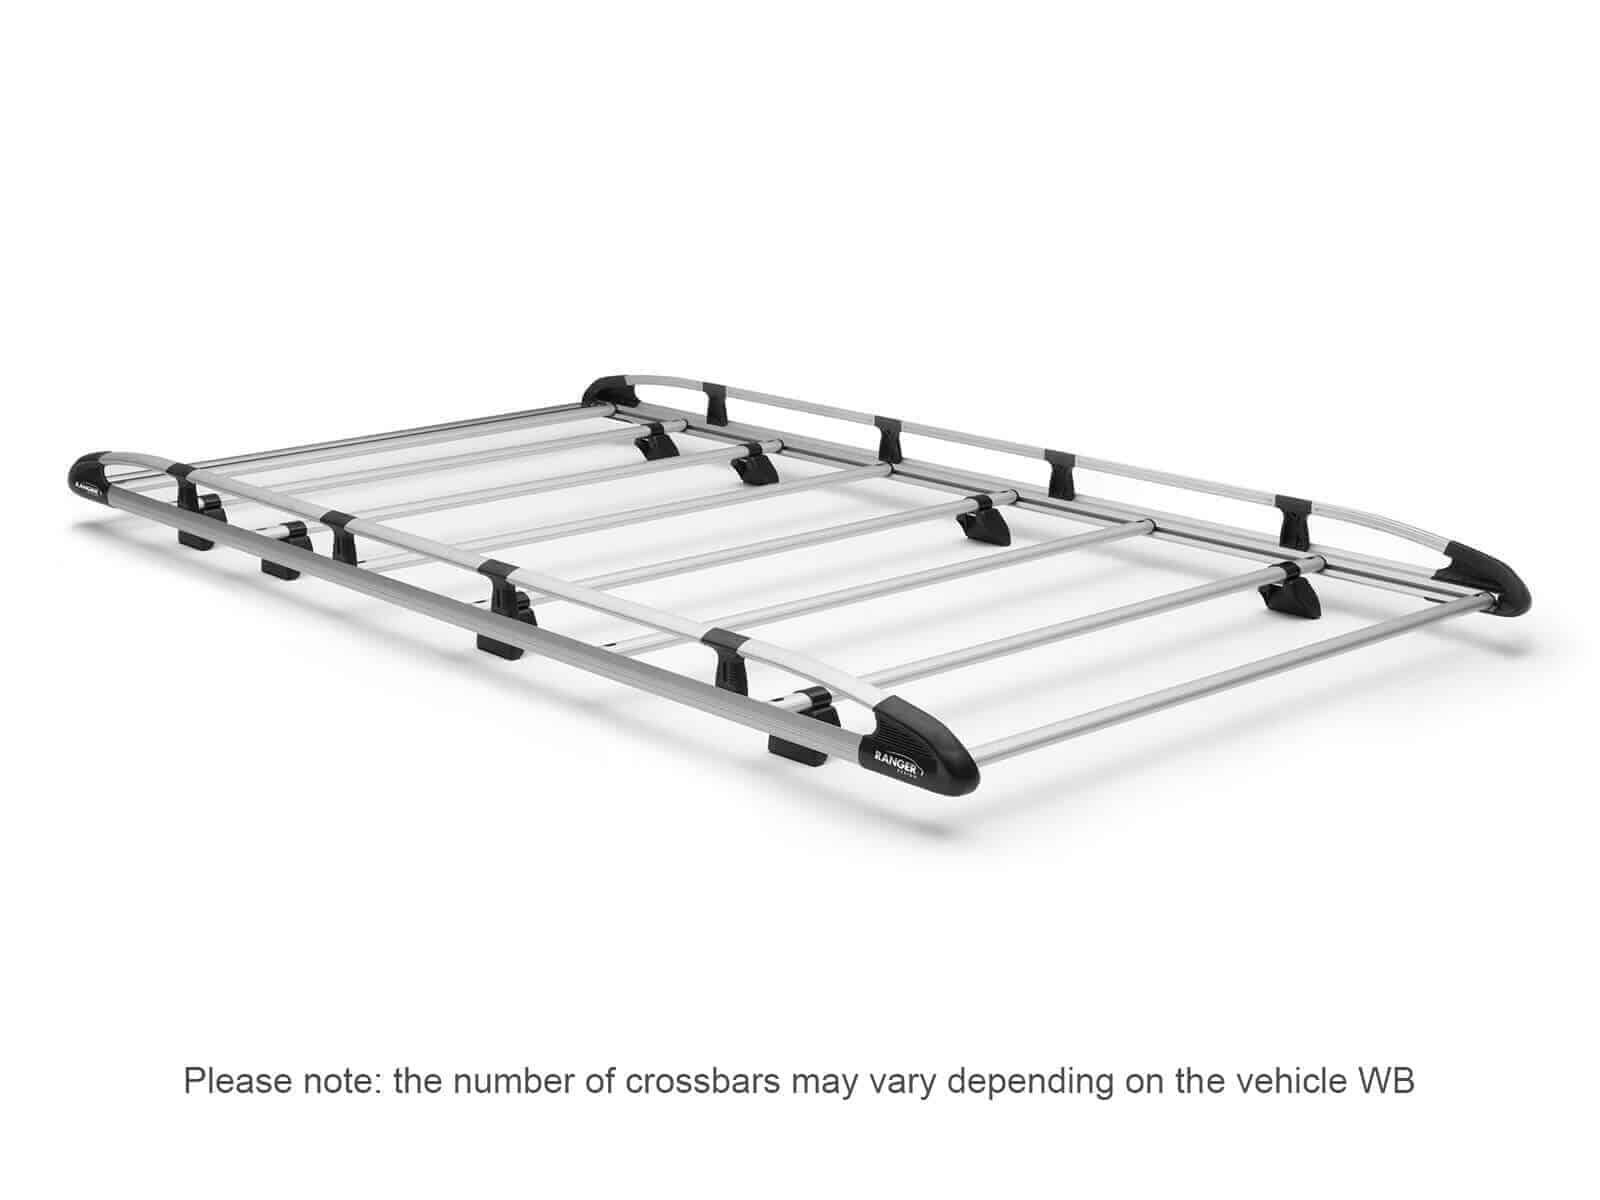 Cargo Rack For Vans Ram Promaster City